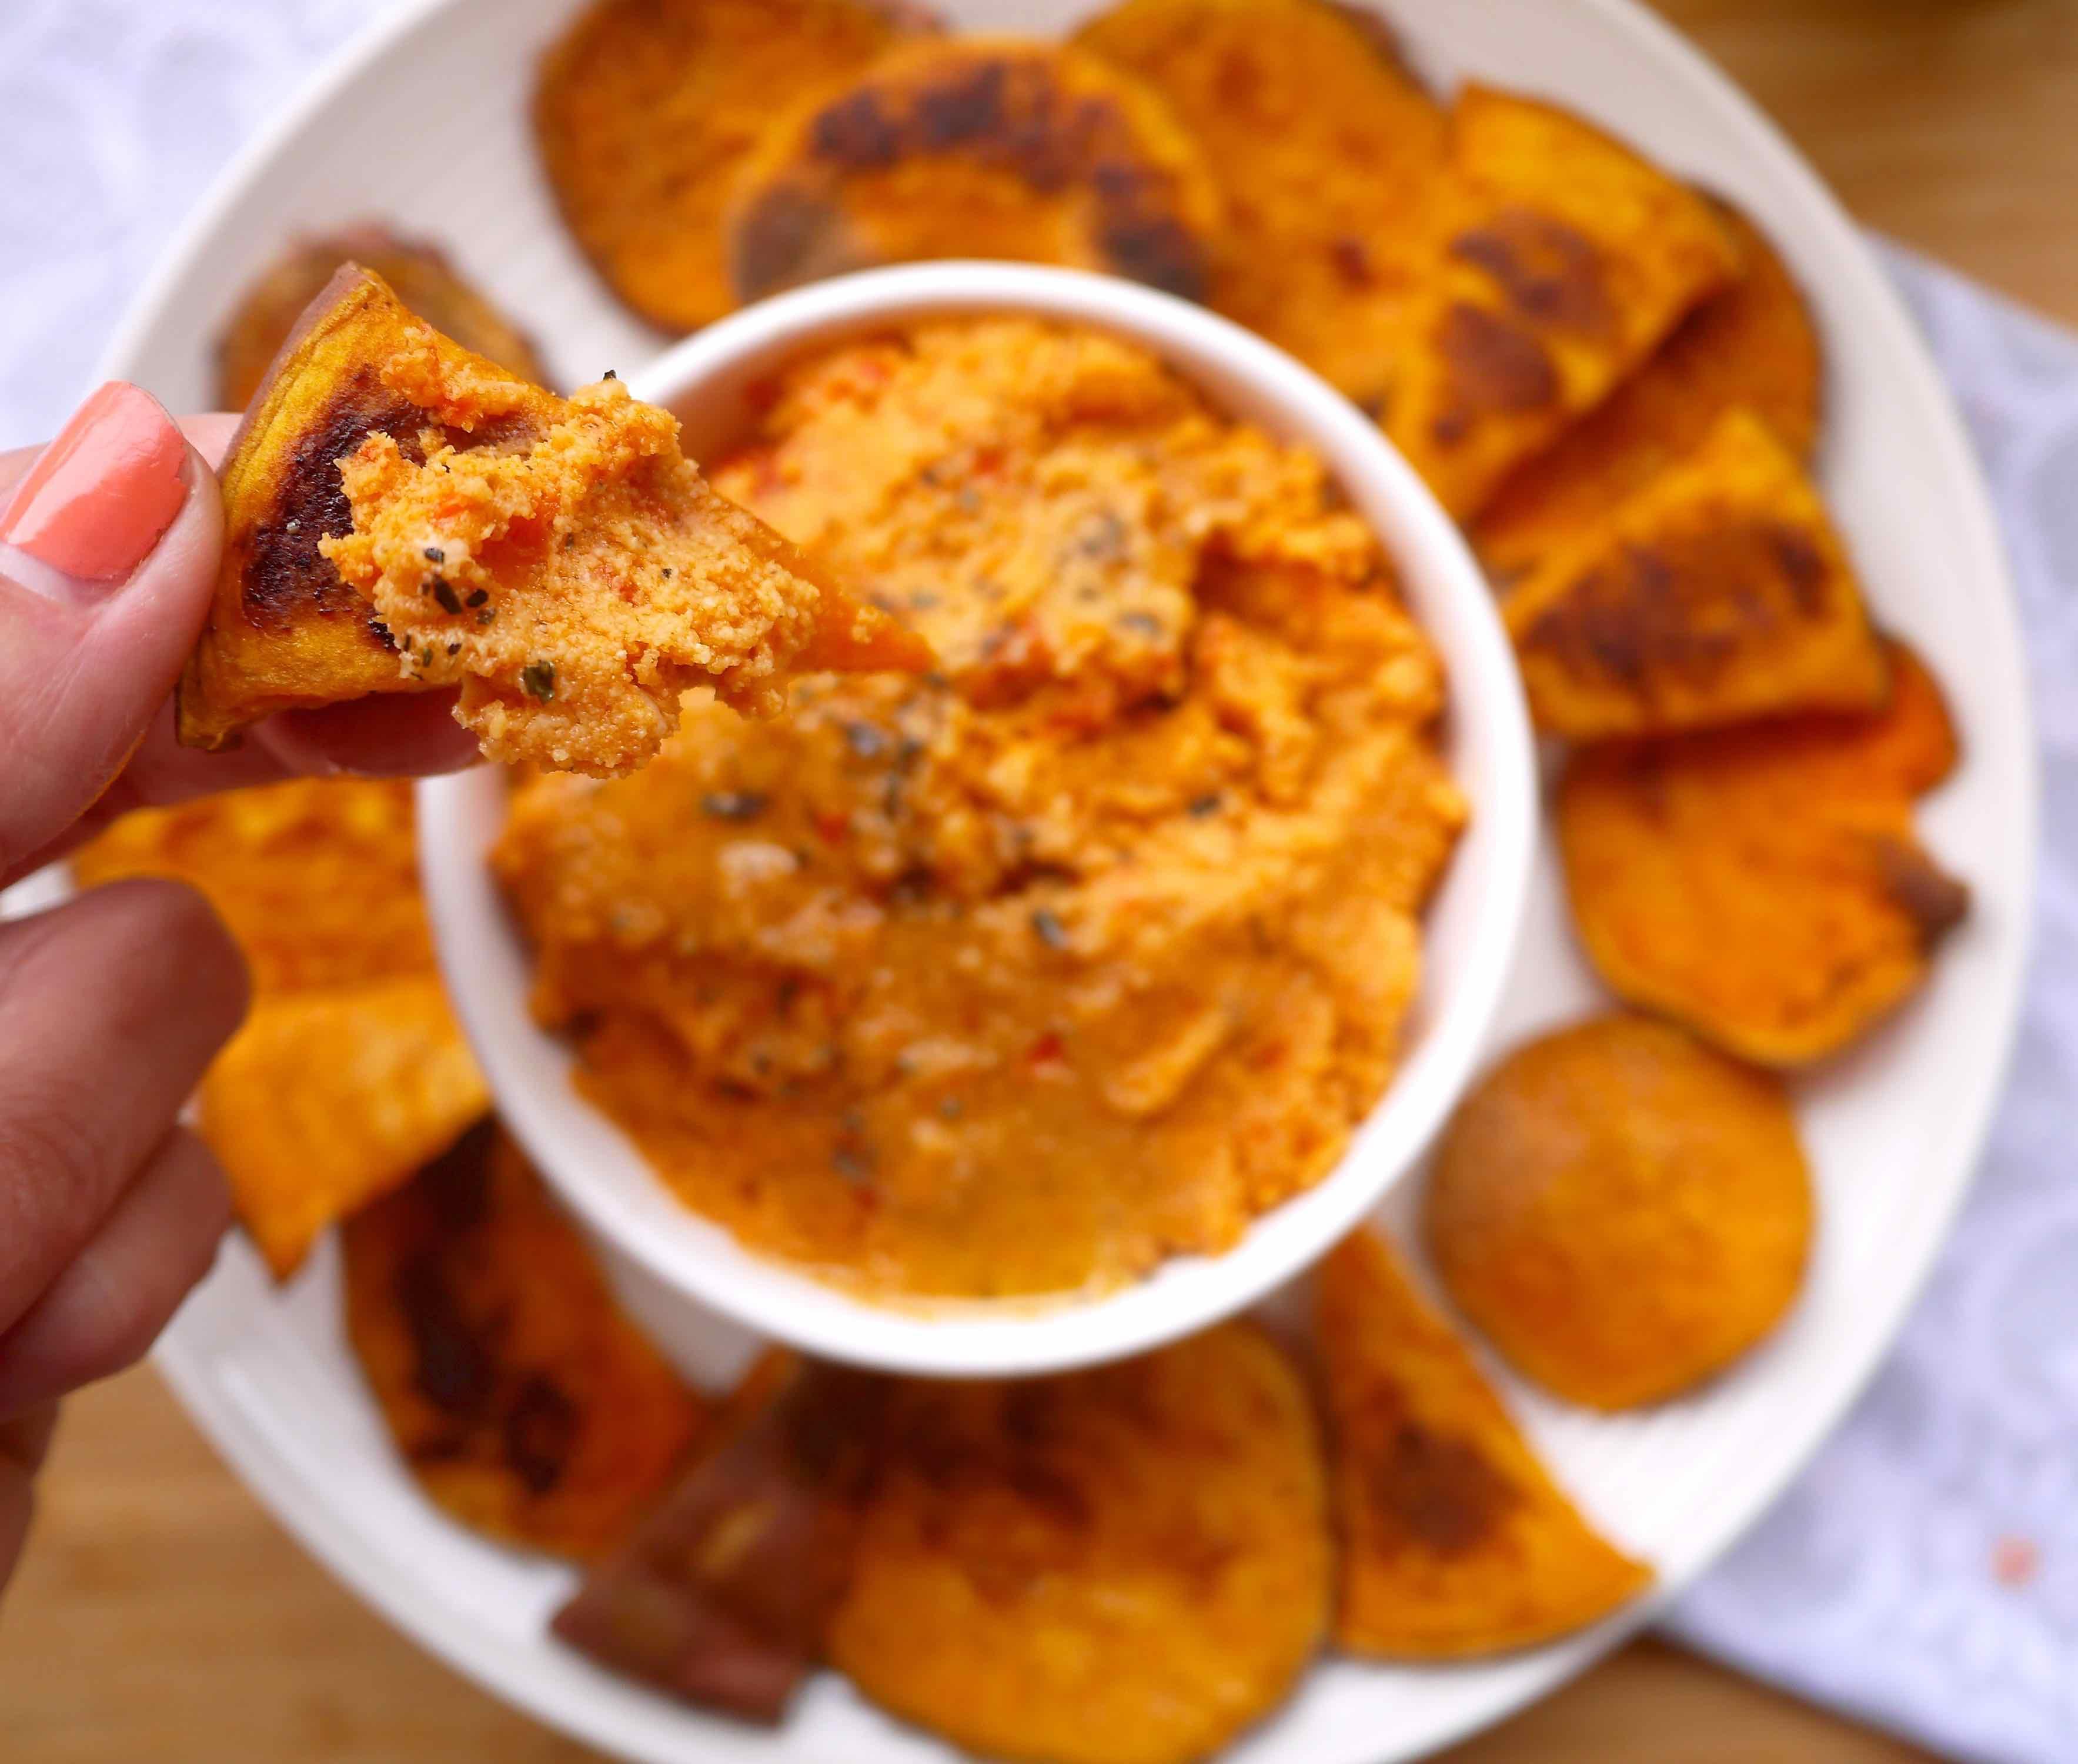 Paleo Garlic and Sun-dried Tomato Hummus (GF) | Perchance ...